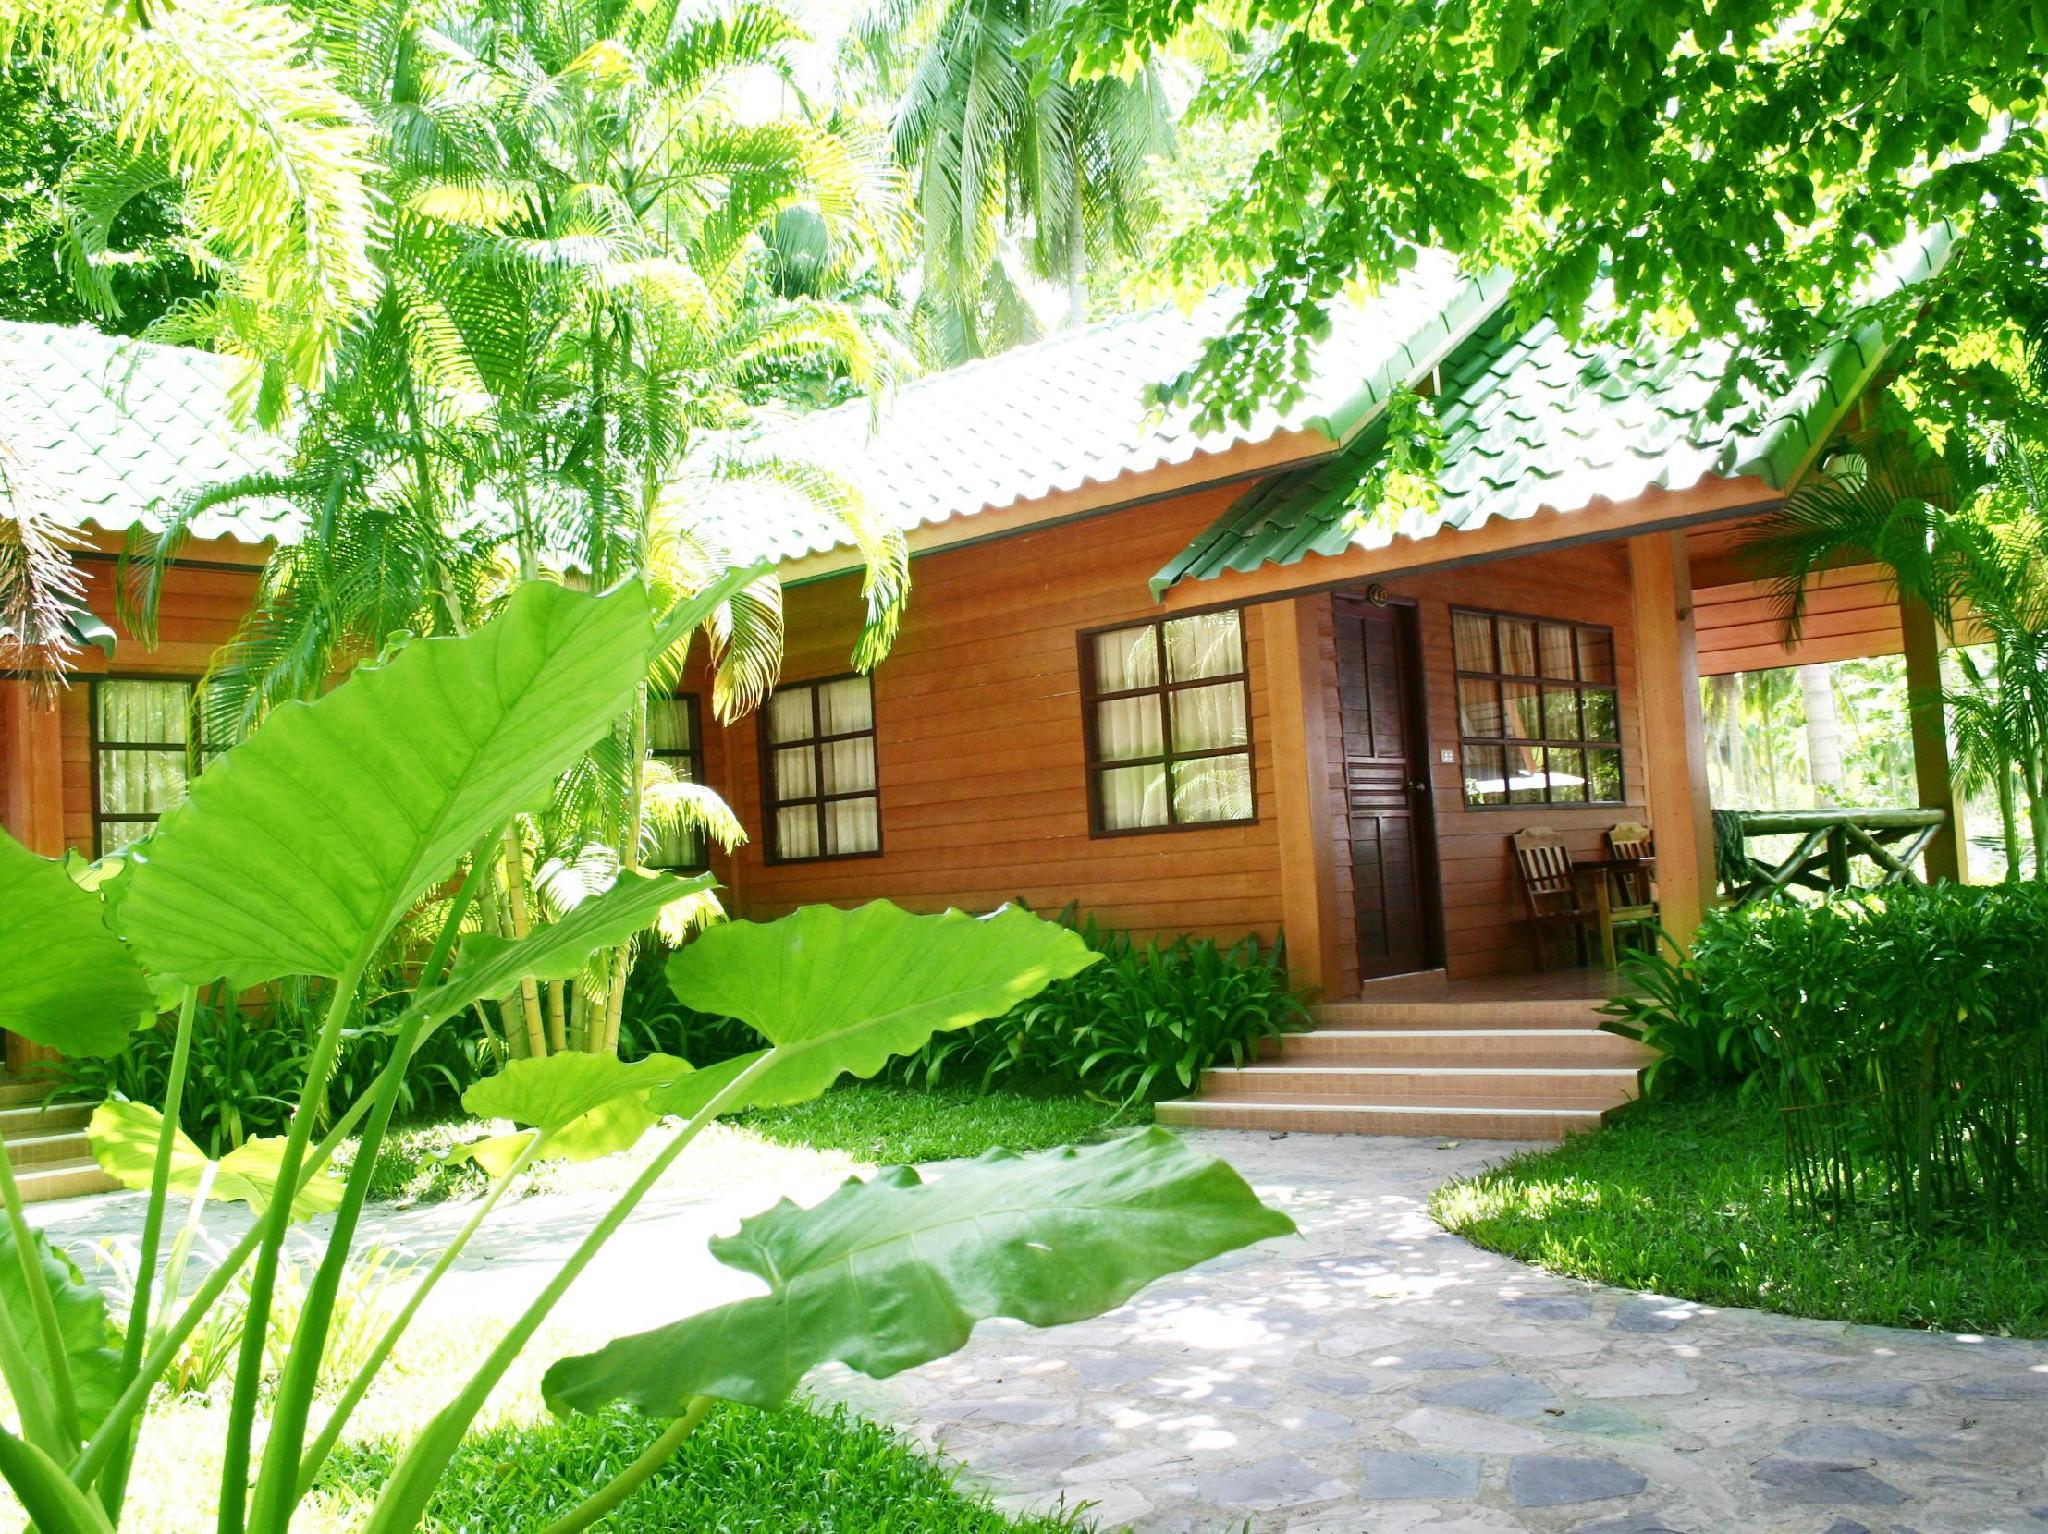 Bankrut Green View Resort,บ้านกรูด กรีนวิว รีสอร์ท